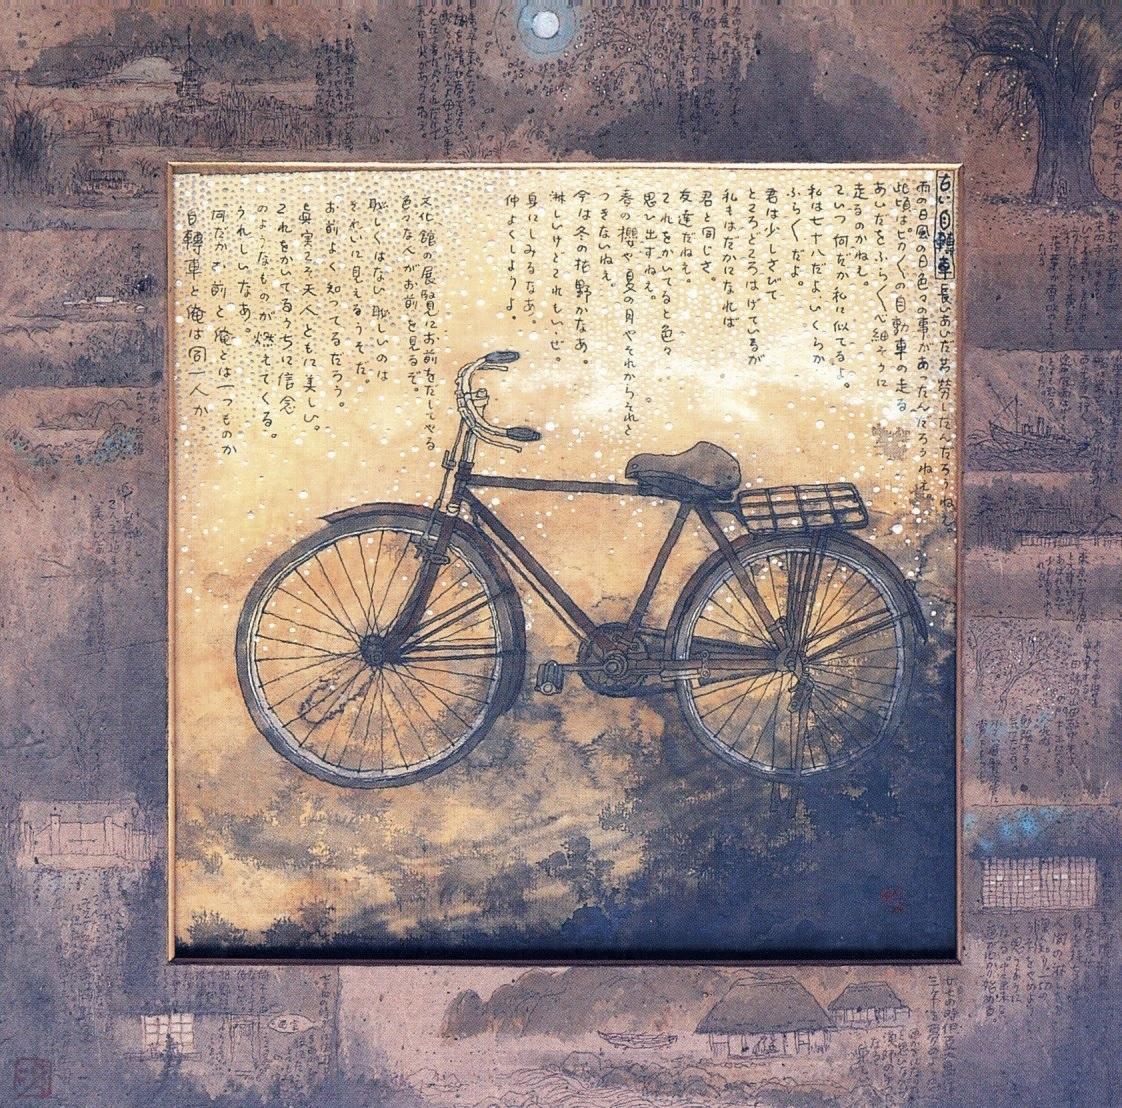 《古い自転車》昭和43(1968)年 個人蔵